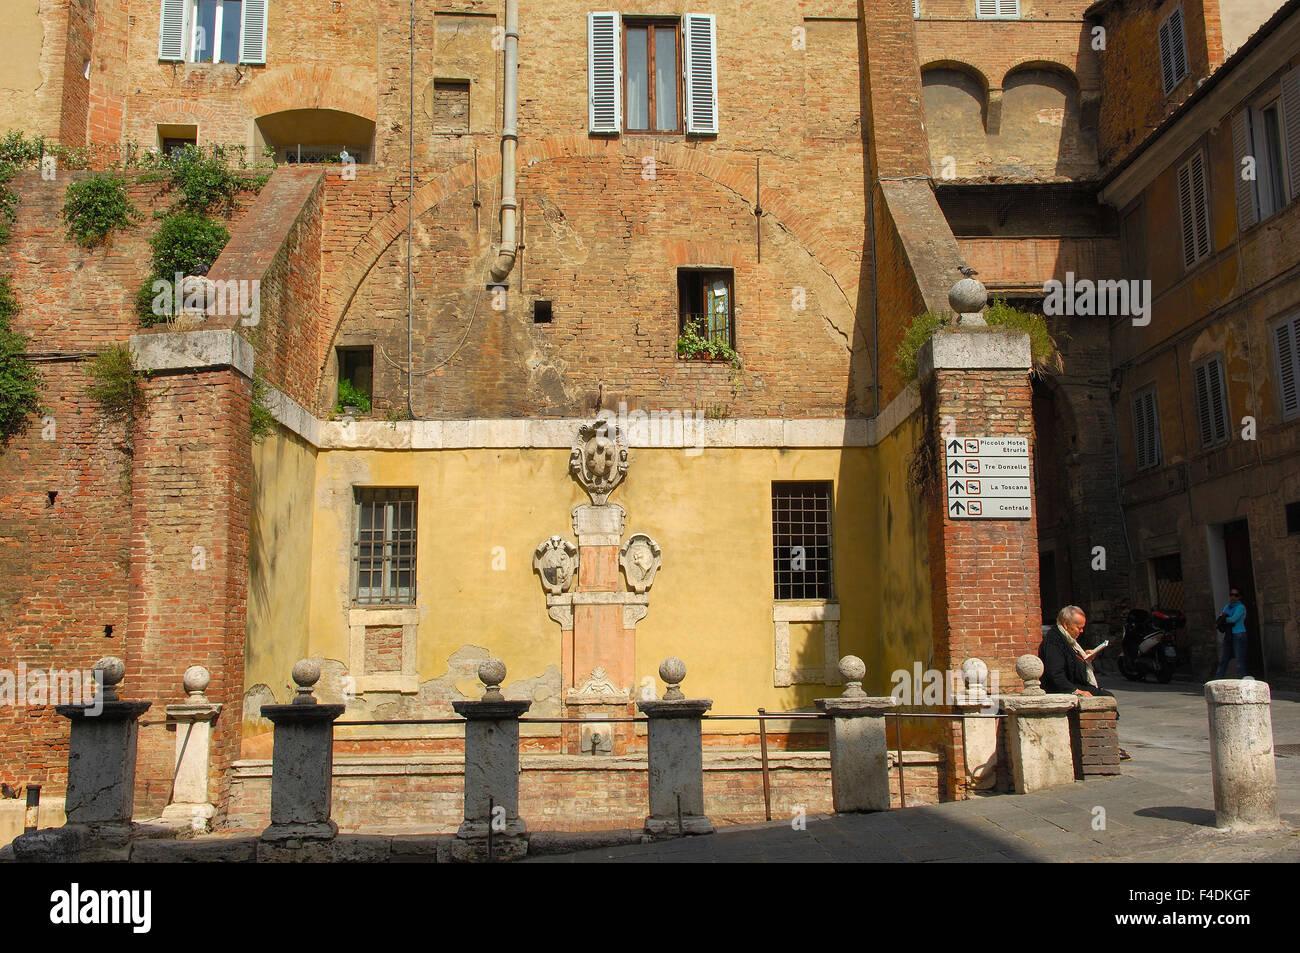 Siena Via Pantaneto Unesco World Stock Photos Pantane Heritage Site Street Tuscany Italy